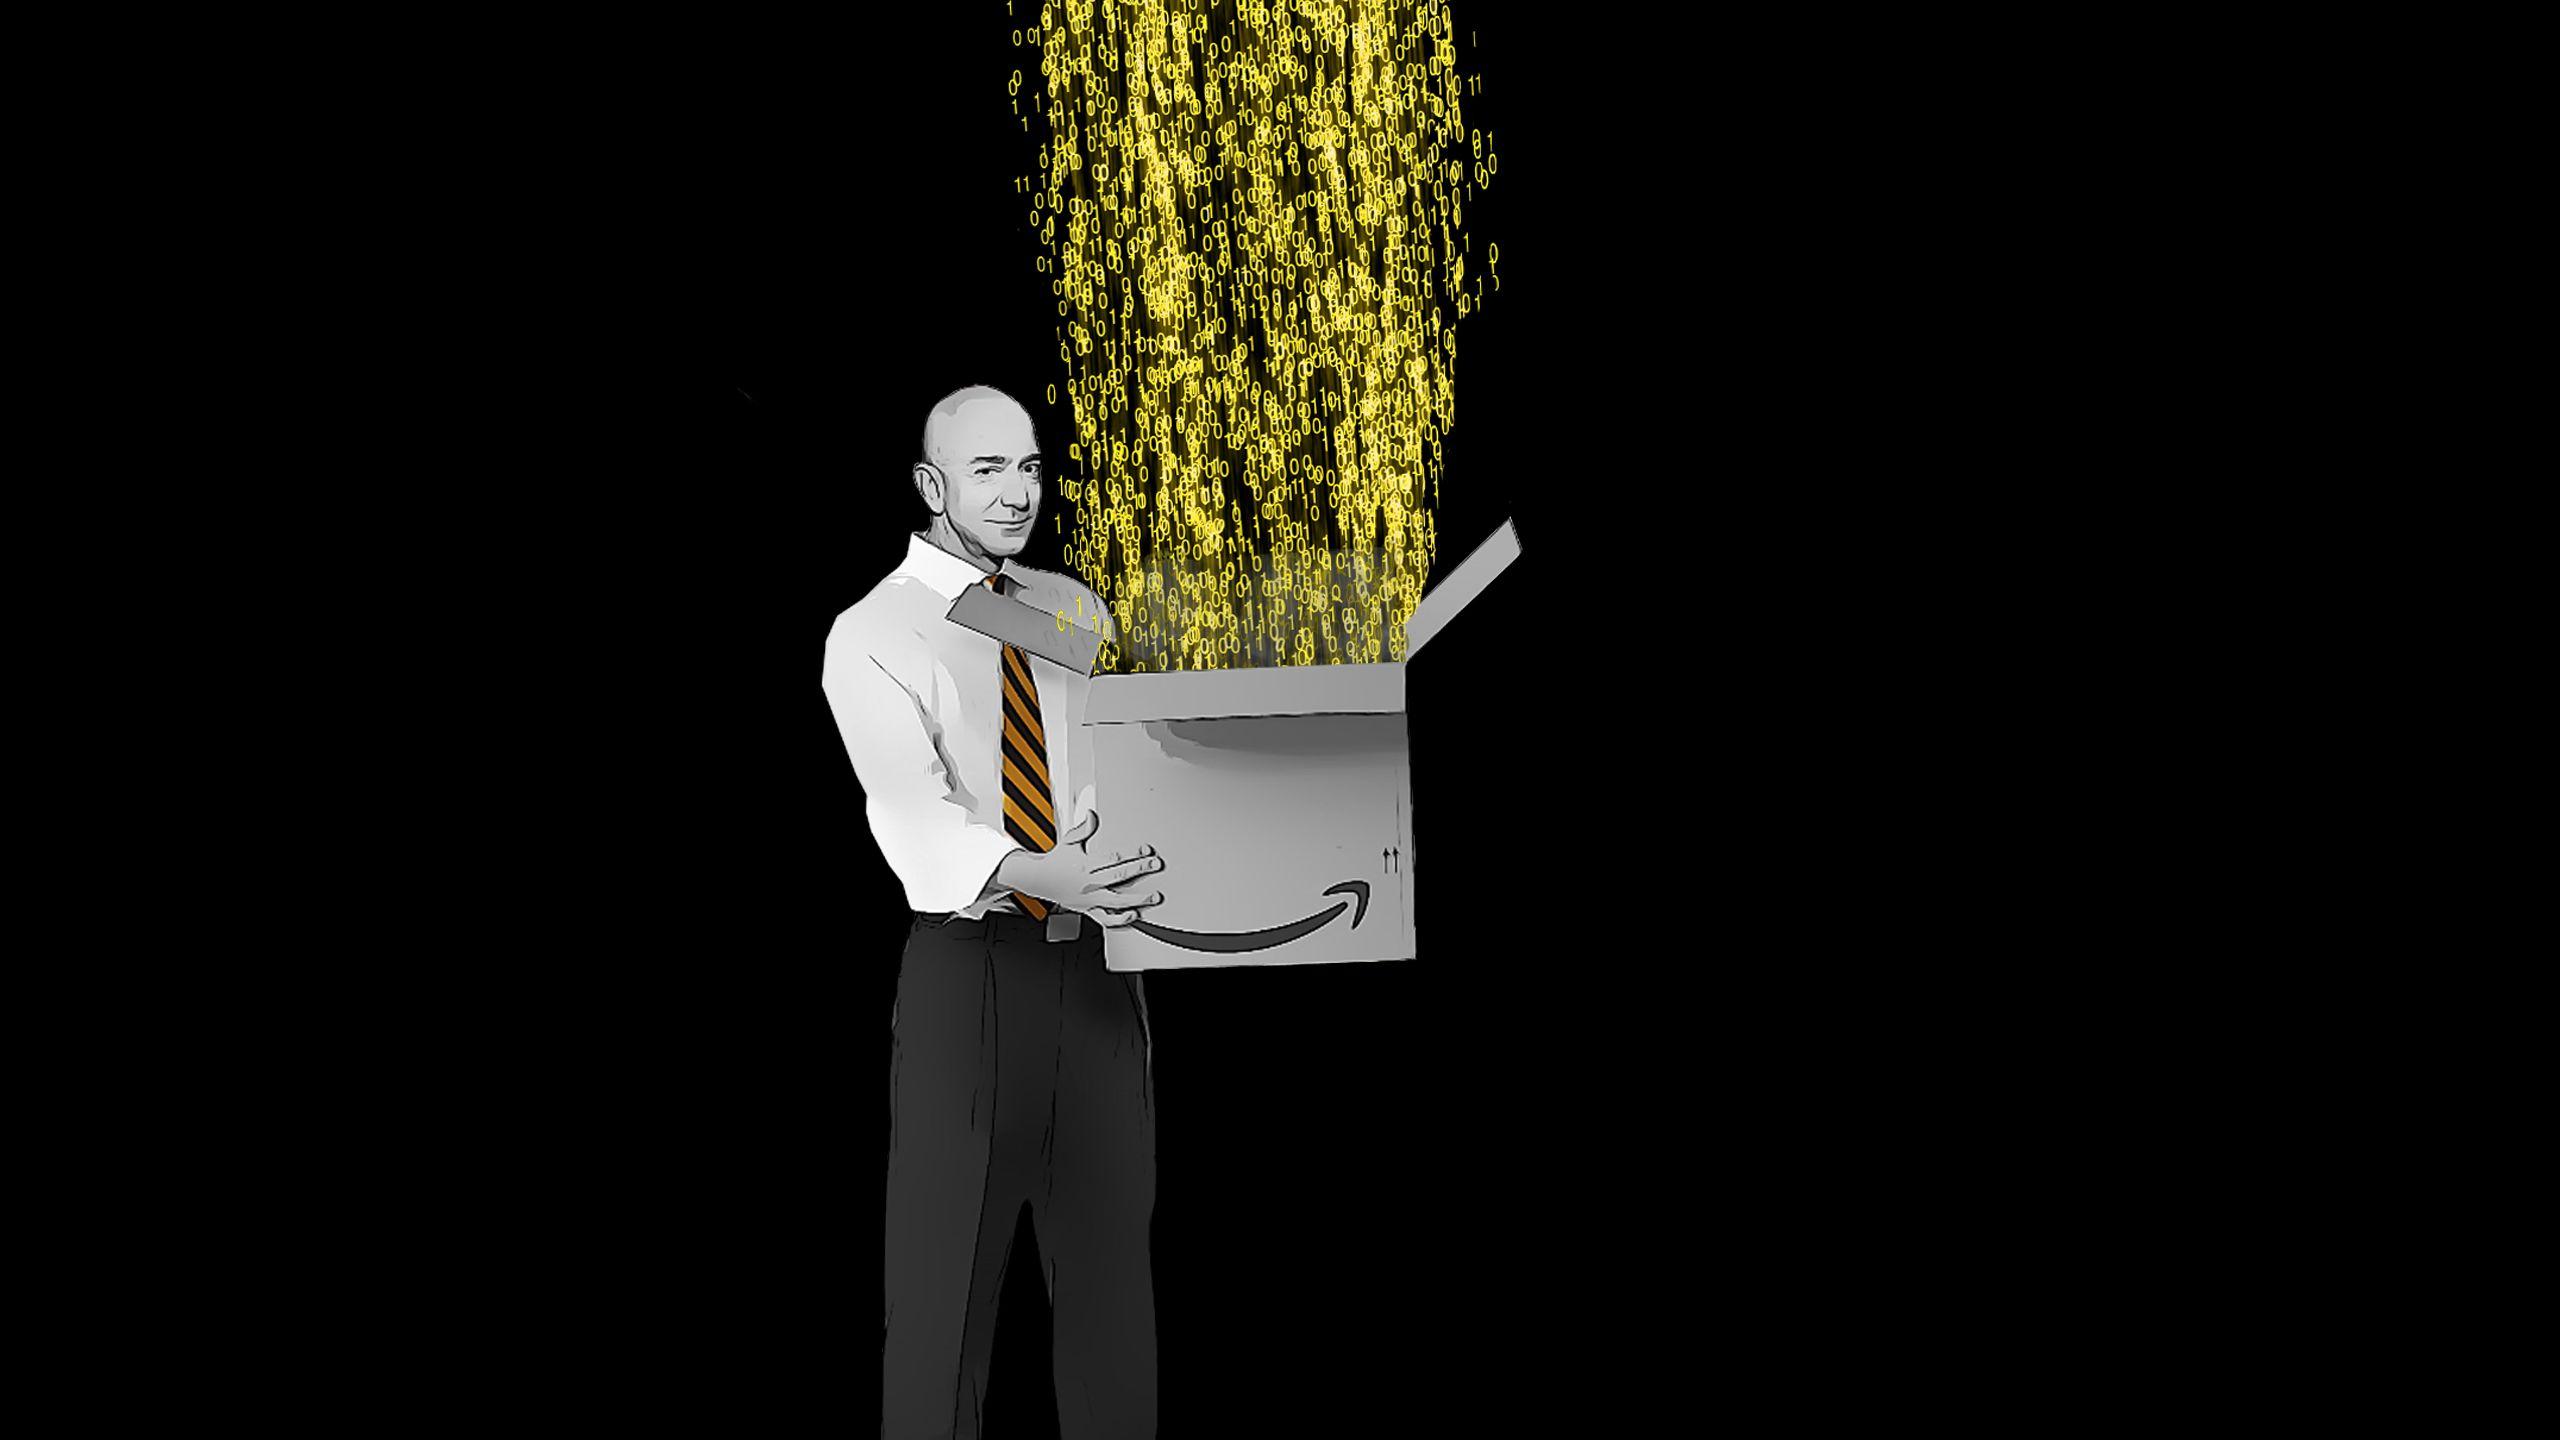 Amazon: How Bezos built his data machine